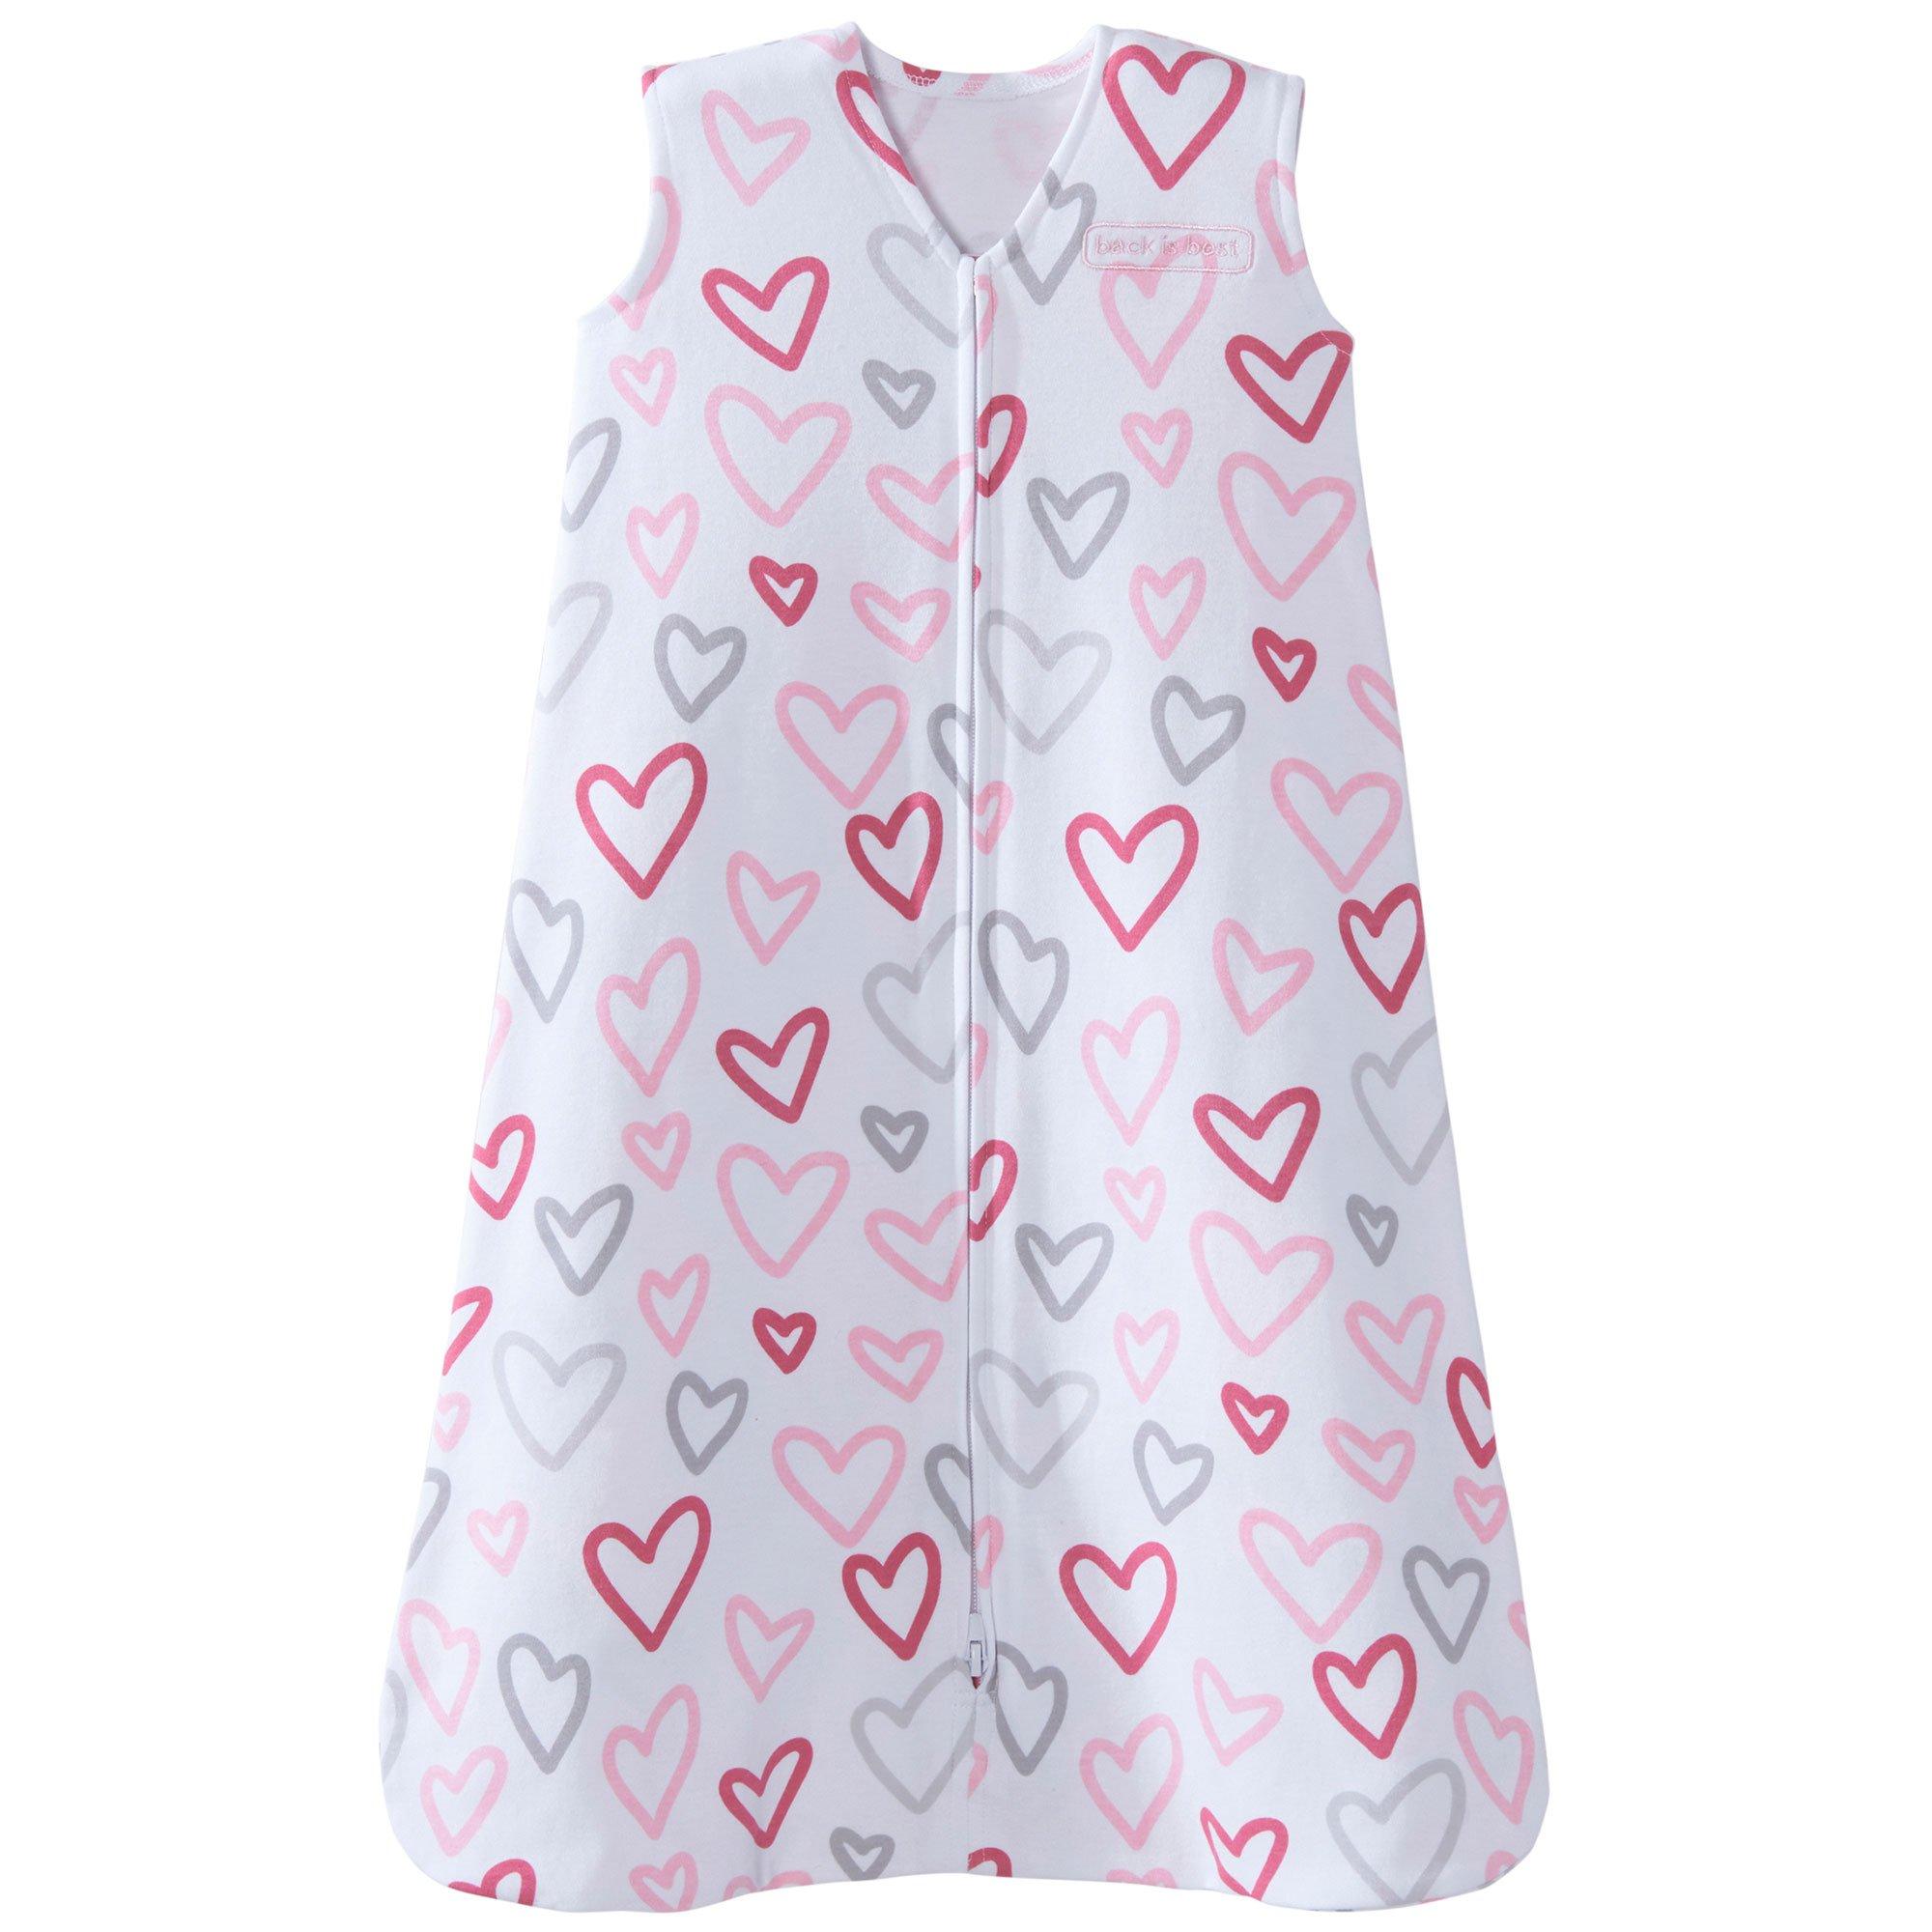 Halo 100% Cotton Sleepsack Wearable Blanket, Modern